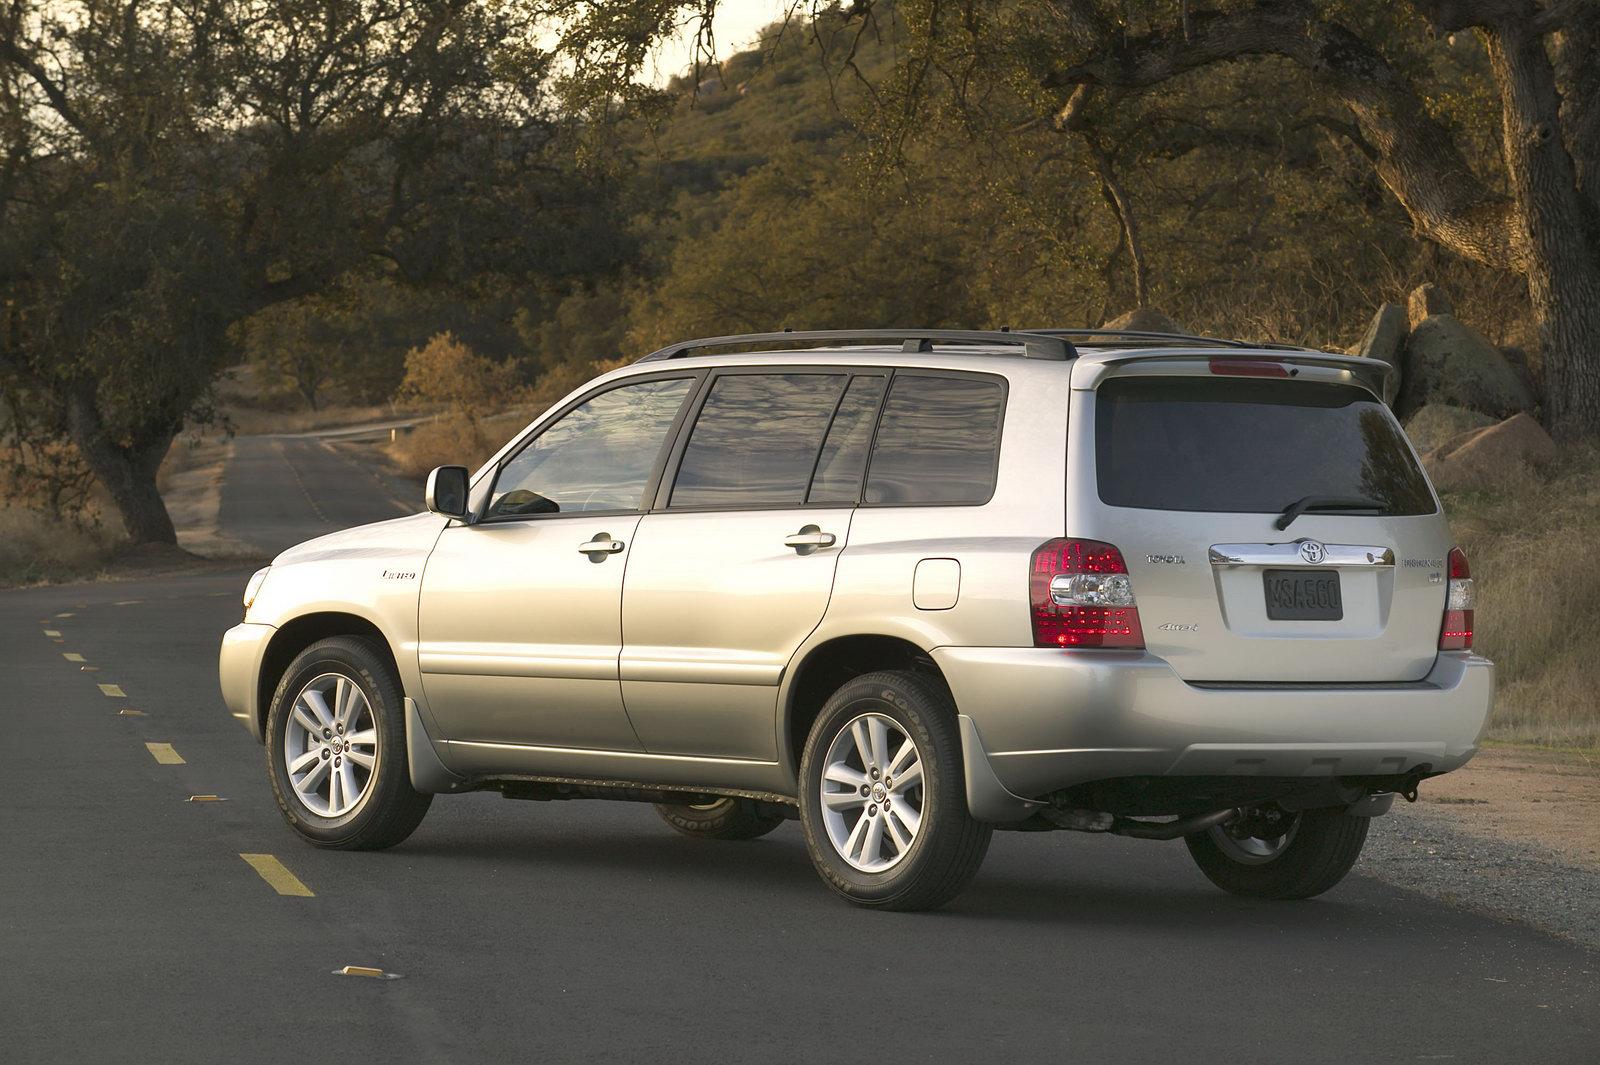 Toyota Highlander 2004 технические характеристики #11